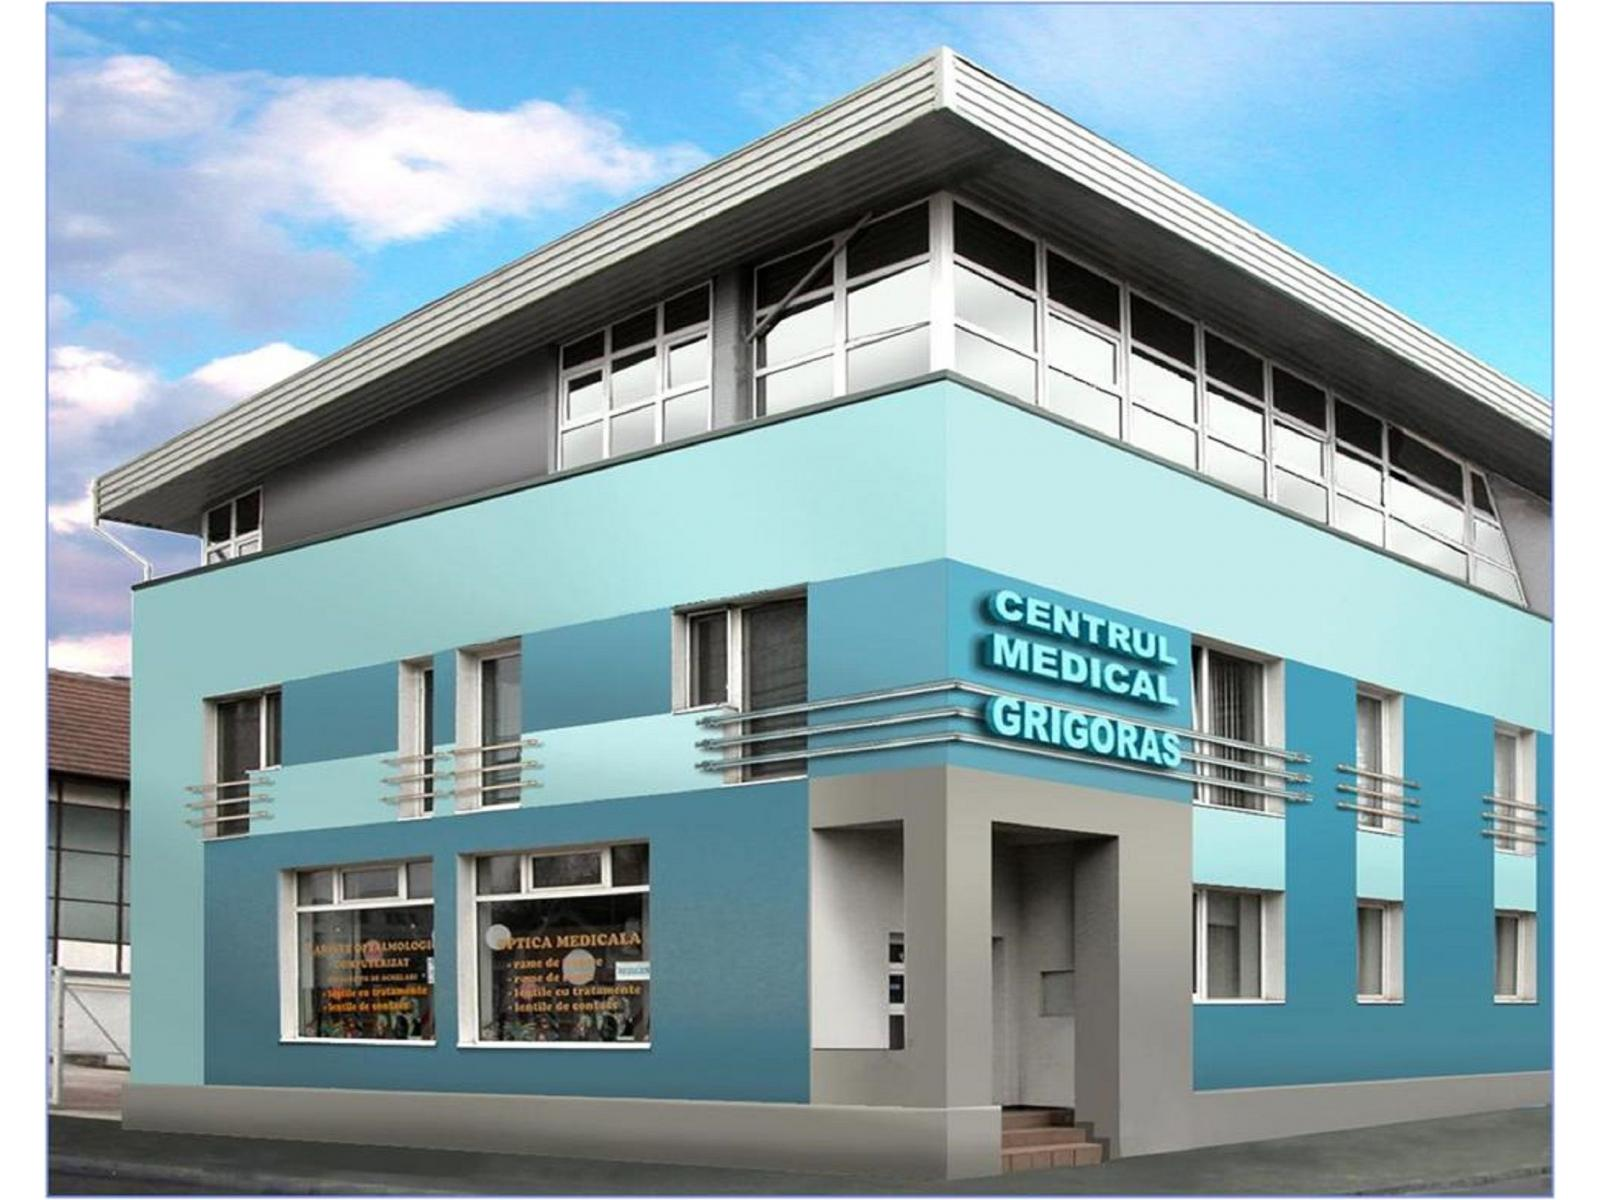 Centrul Medical Dr Grigoras - policlinica_hr.jpg